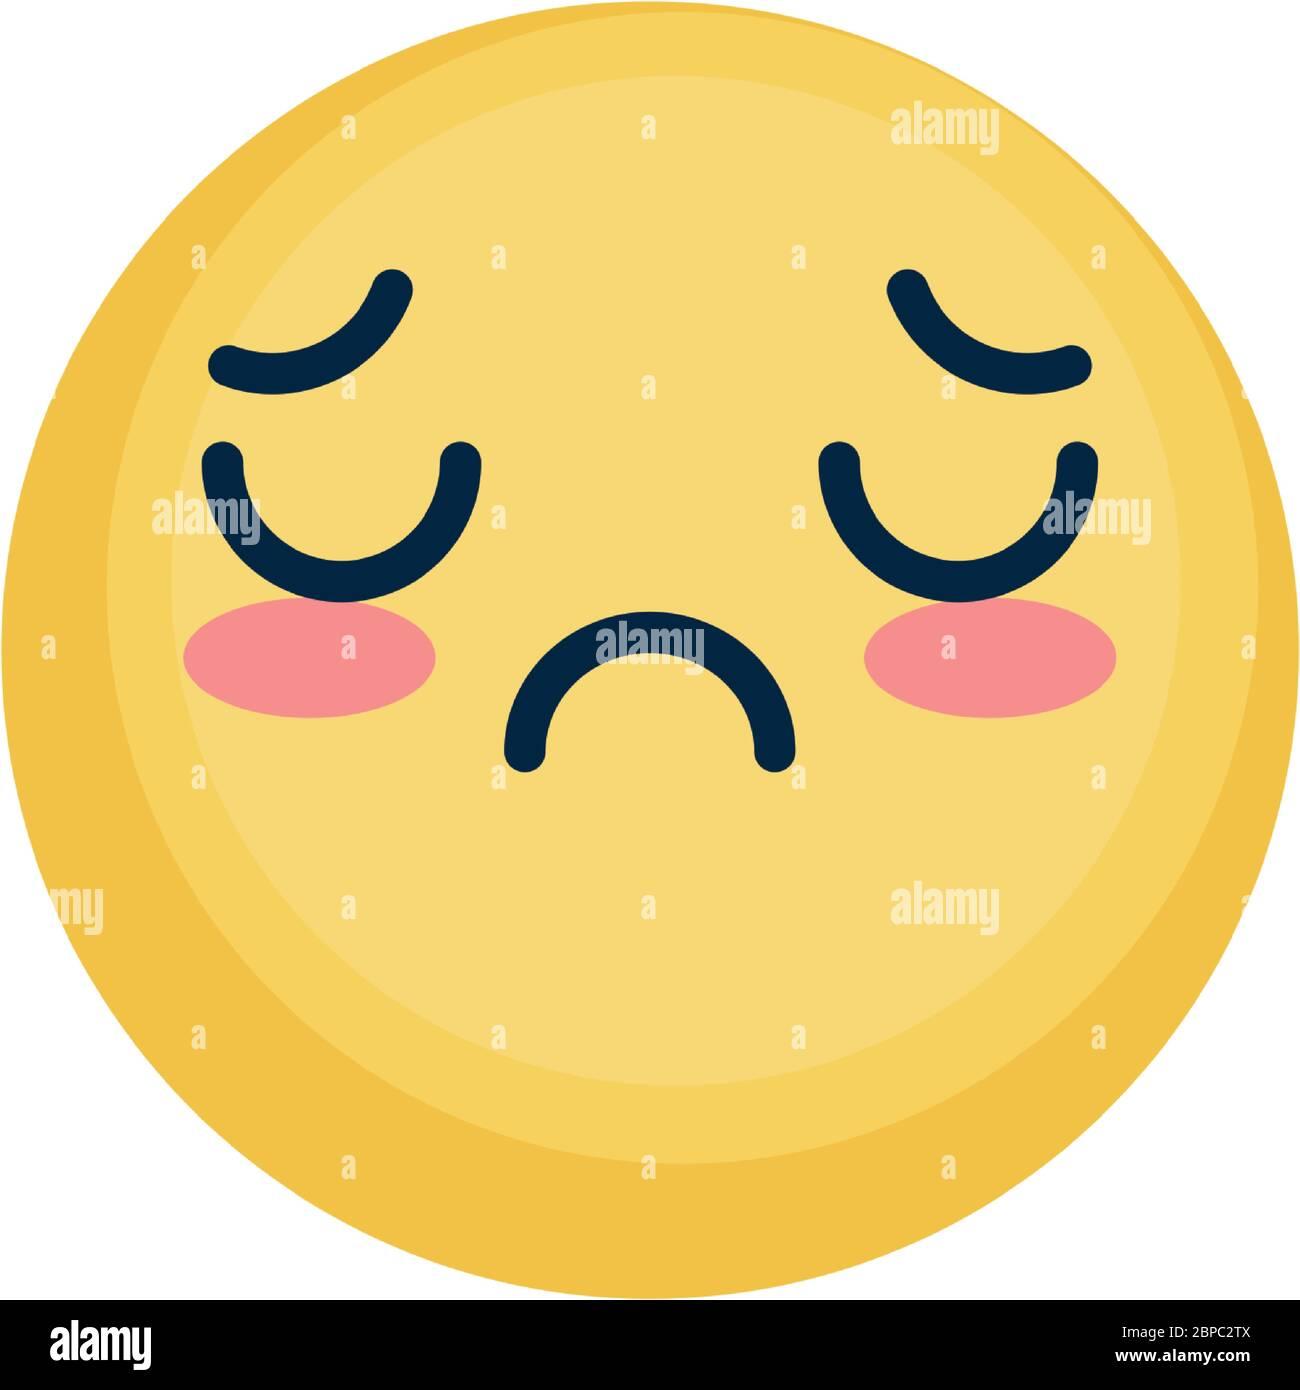 Cute Sad Emoji Face Icon Over White Background Flat Style Vector Illustration Stock Vector Image Art Alamy